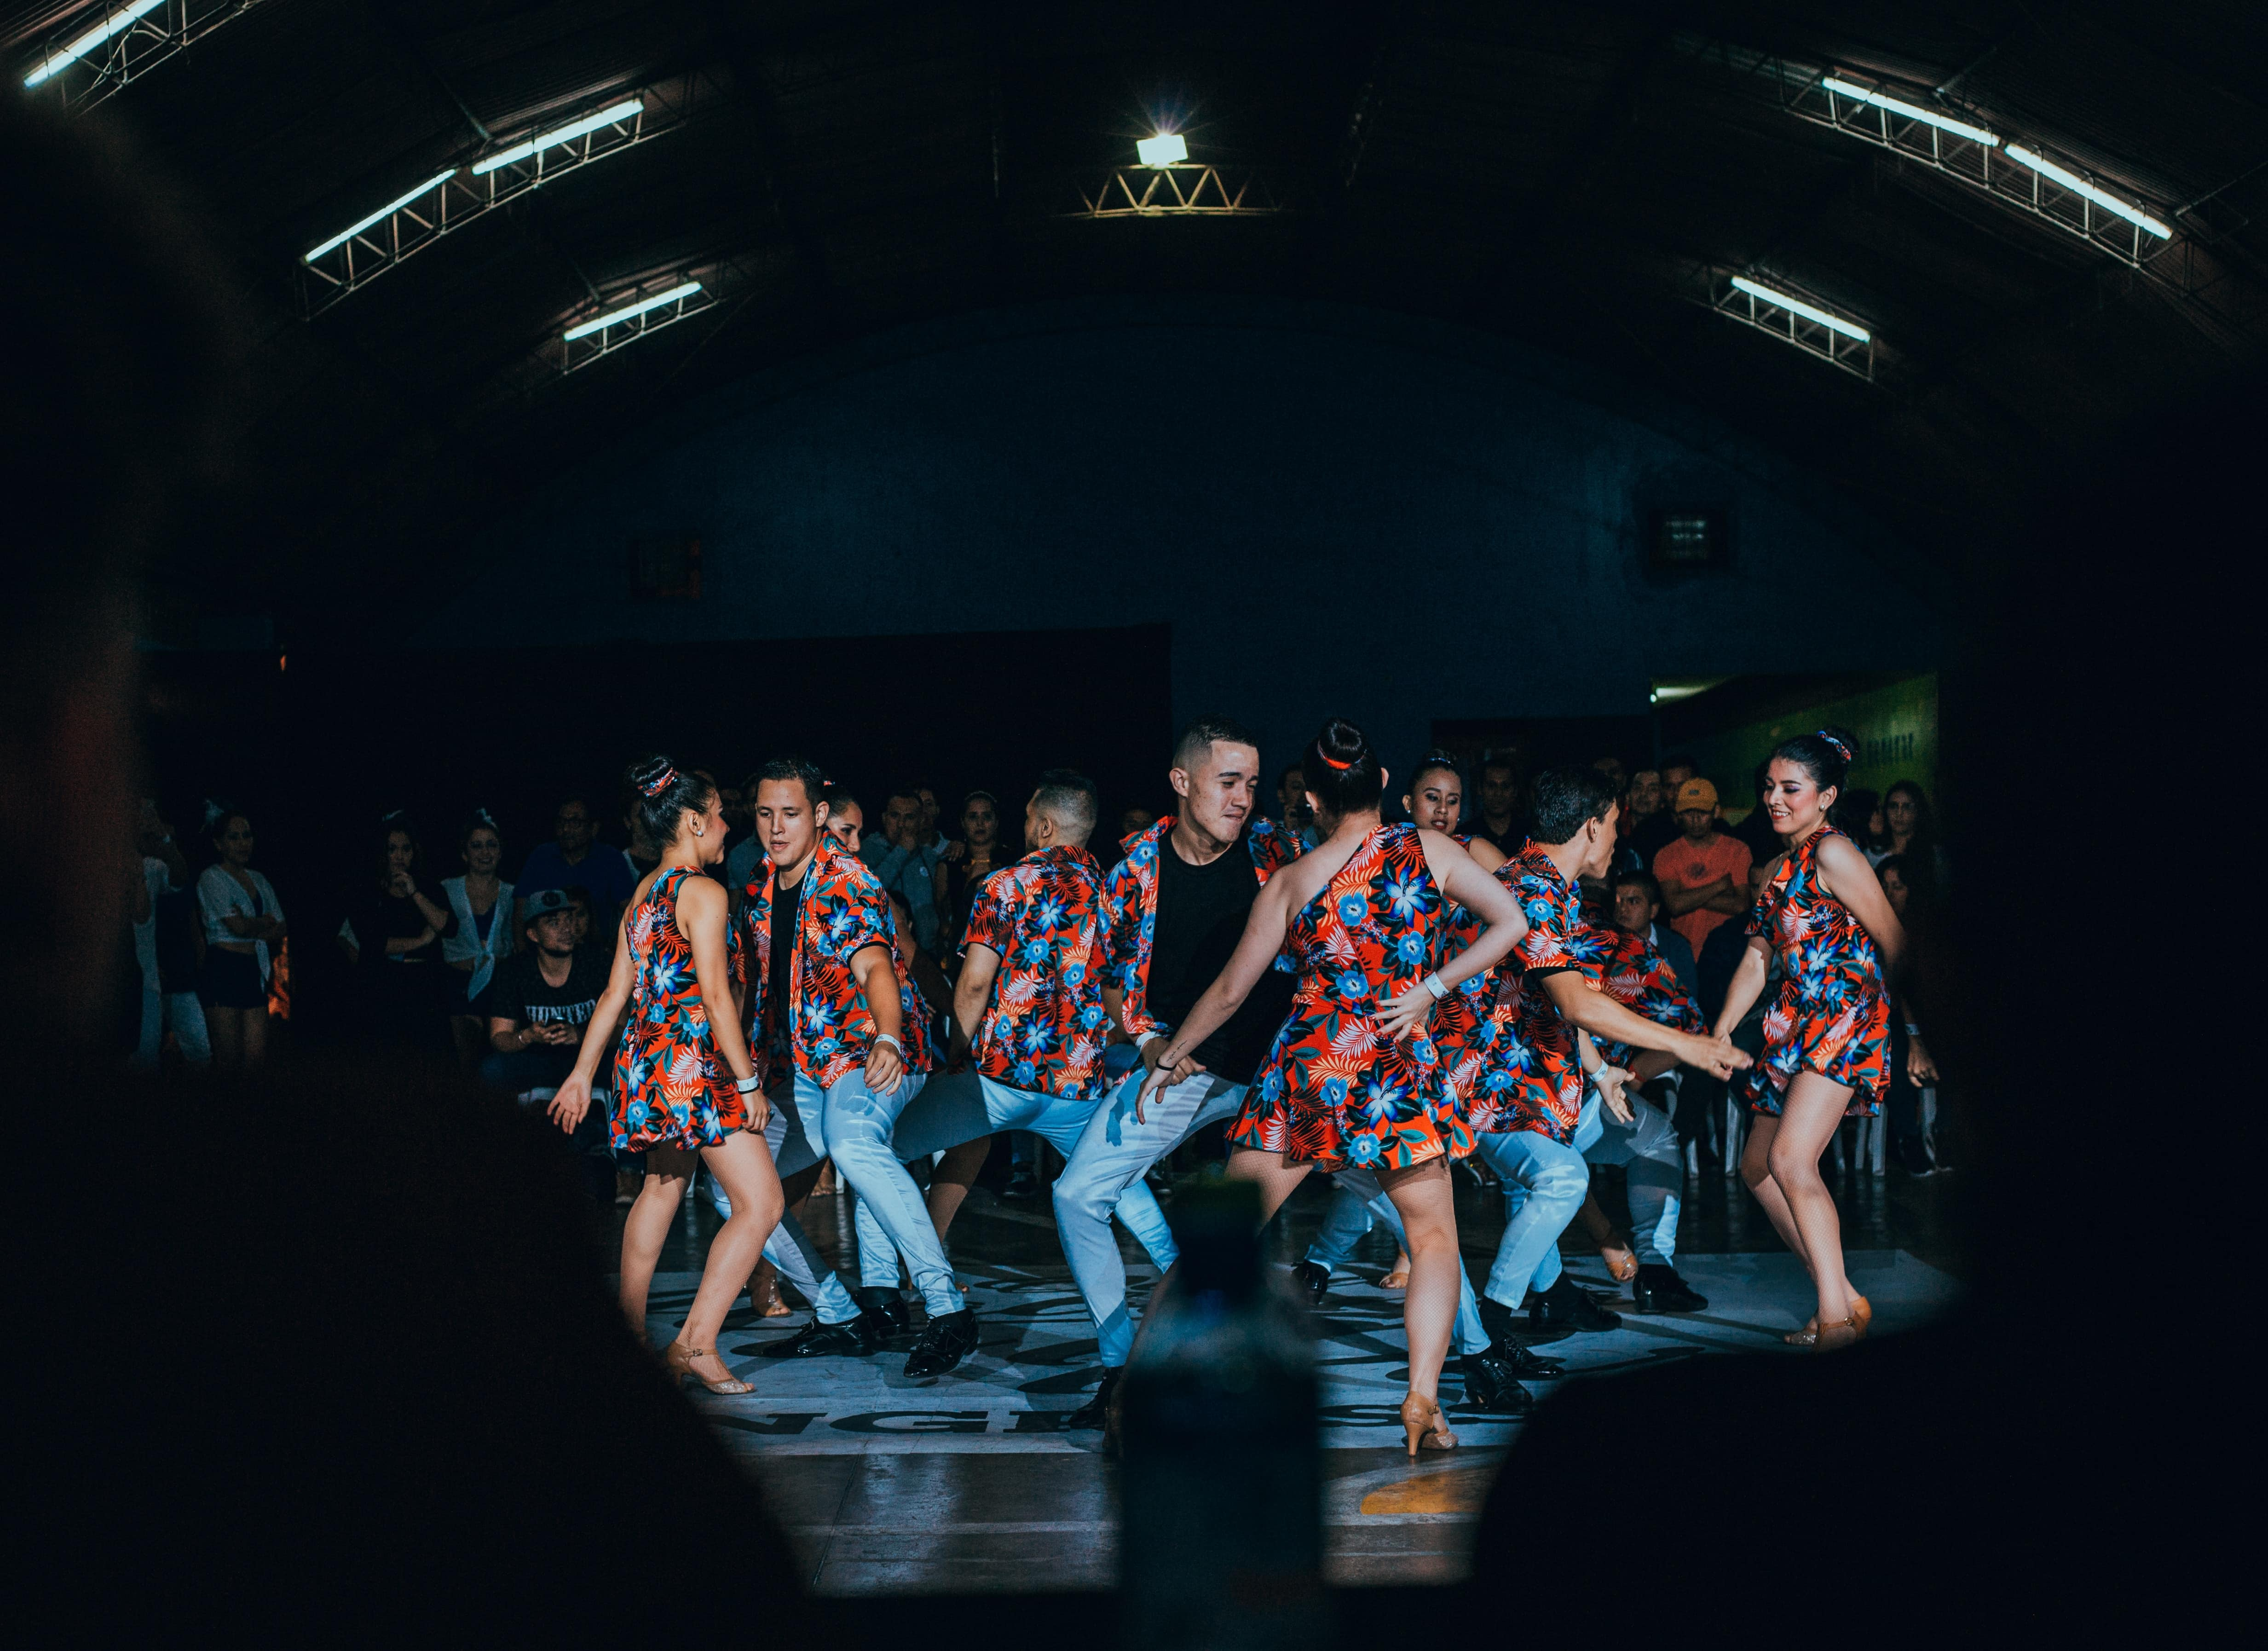 Grupo de bailarines de salsa. Photo by Frank Romero on Unsplash